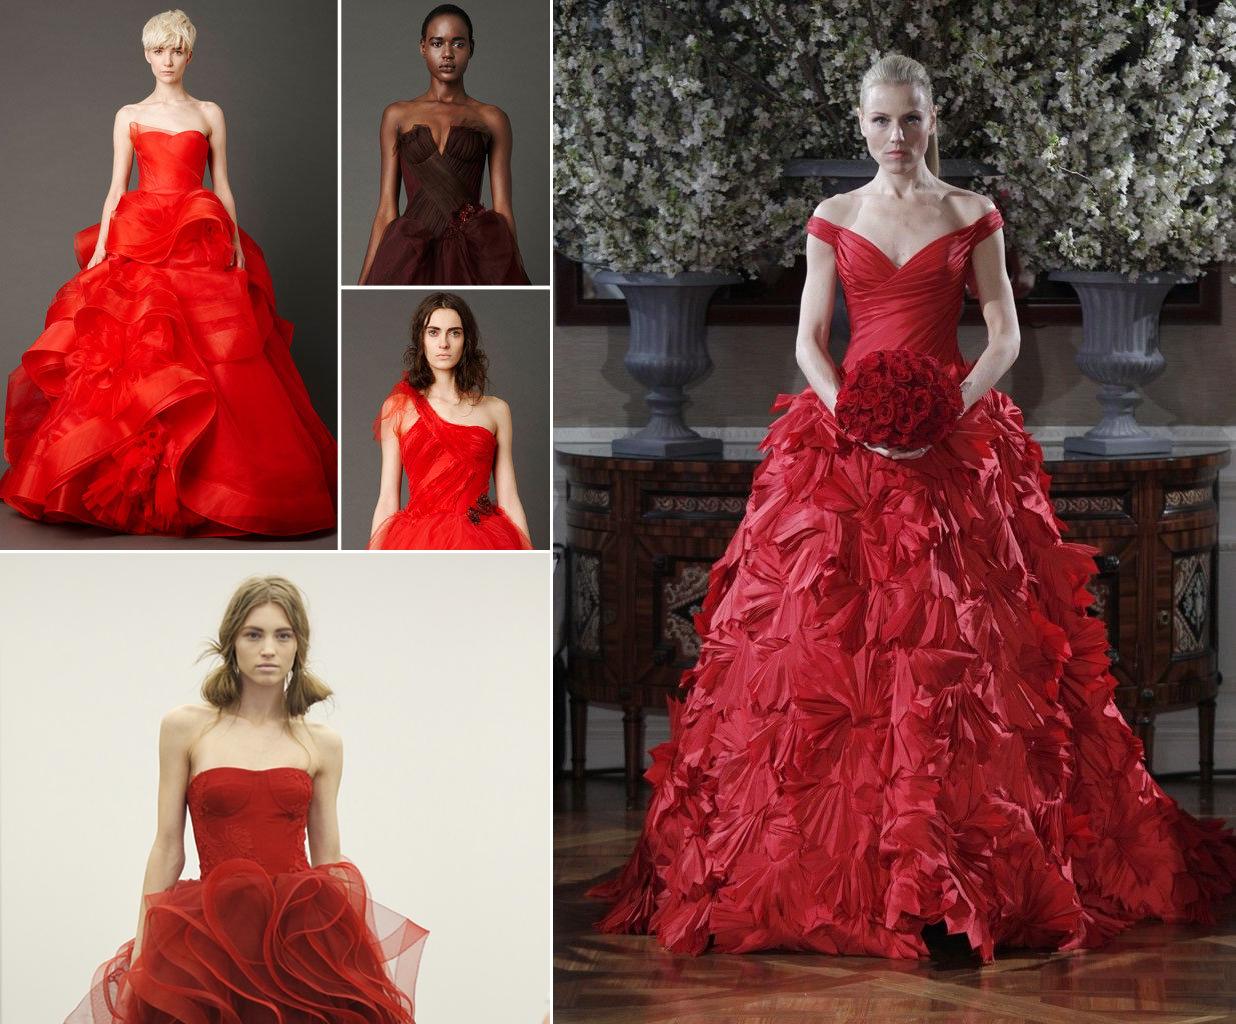 red wedding dresses spring 2013 bridal trends